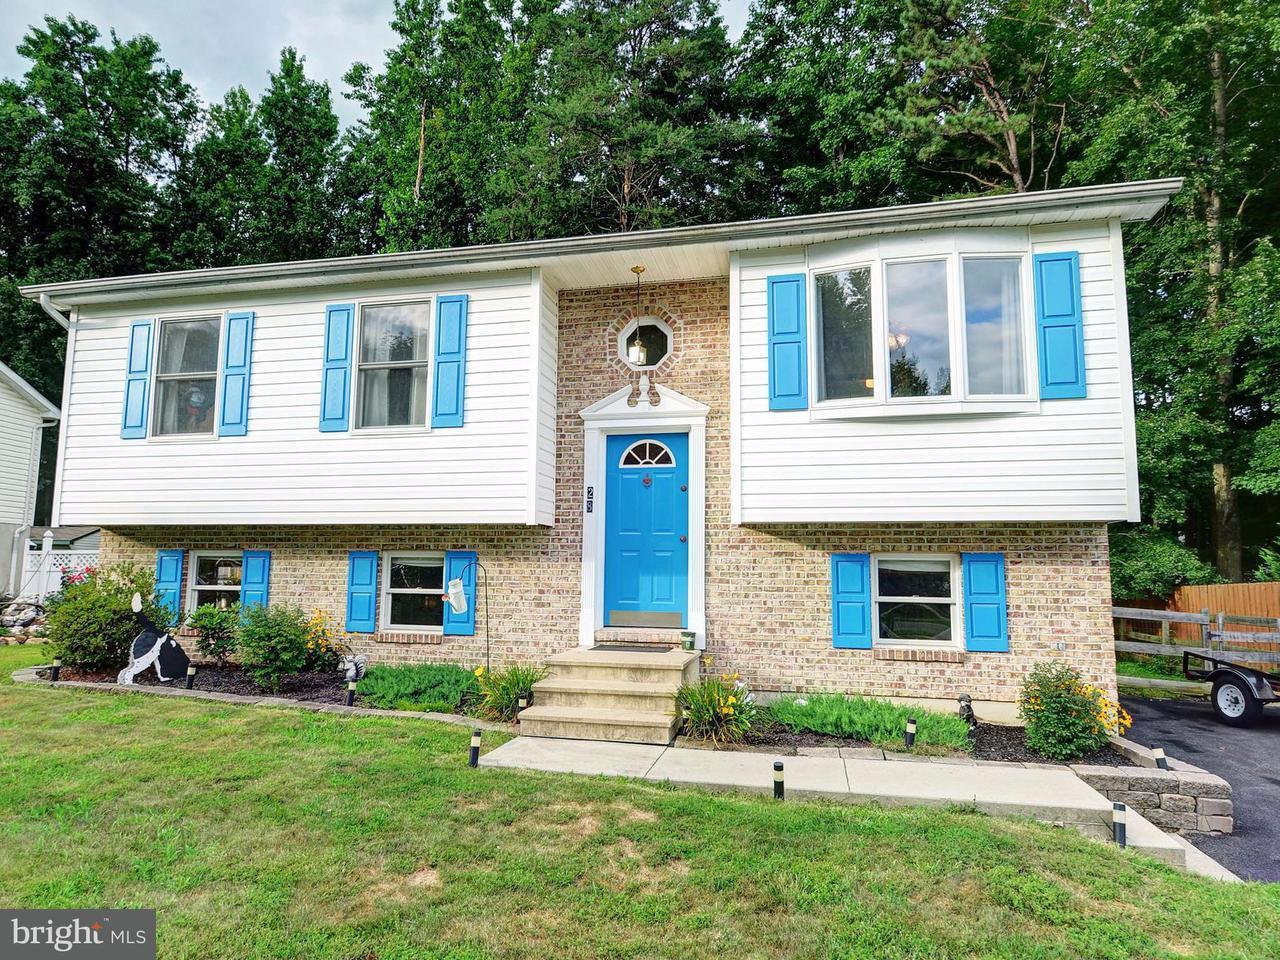 28  Burrwood North East, MD 21901